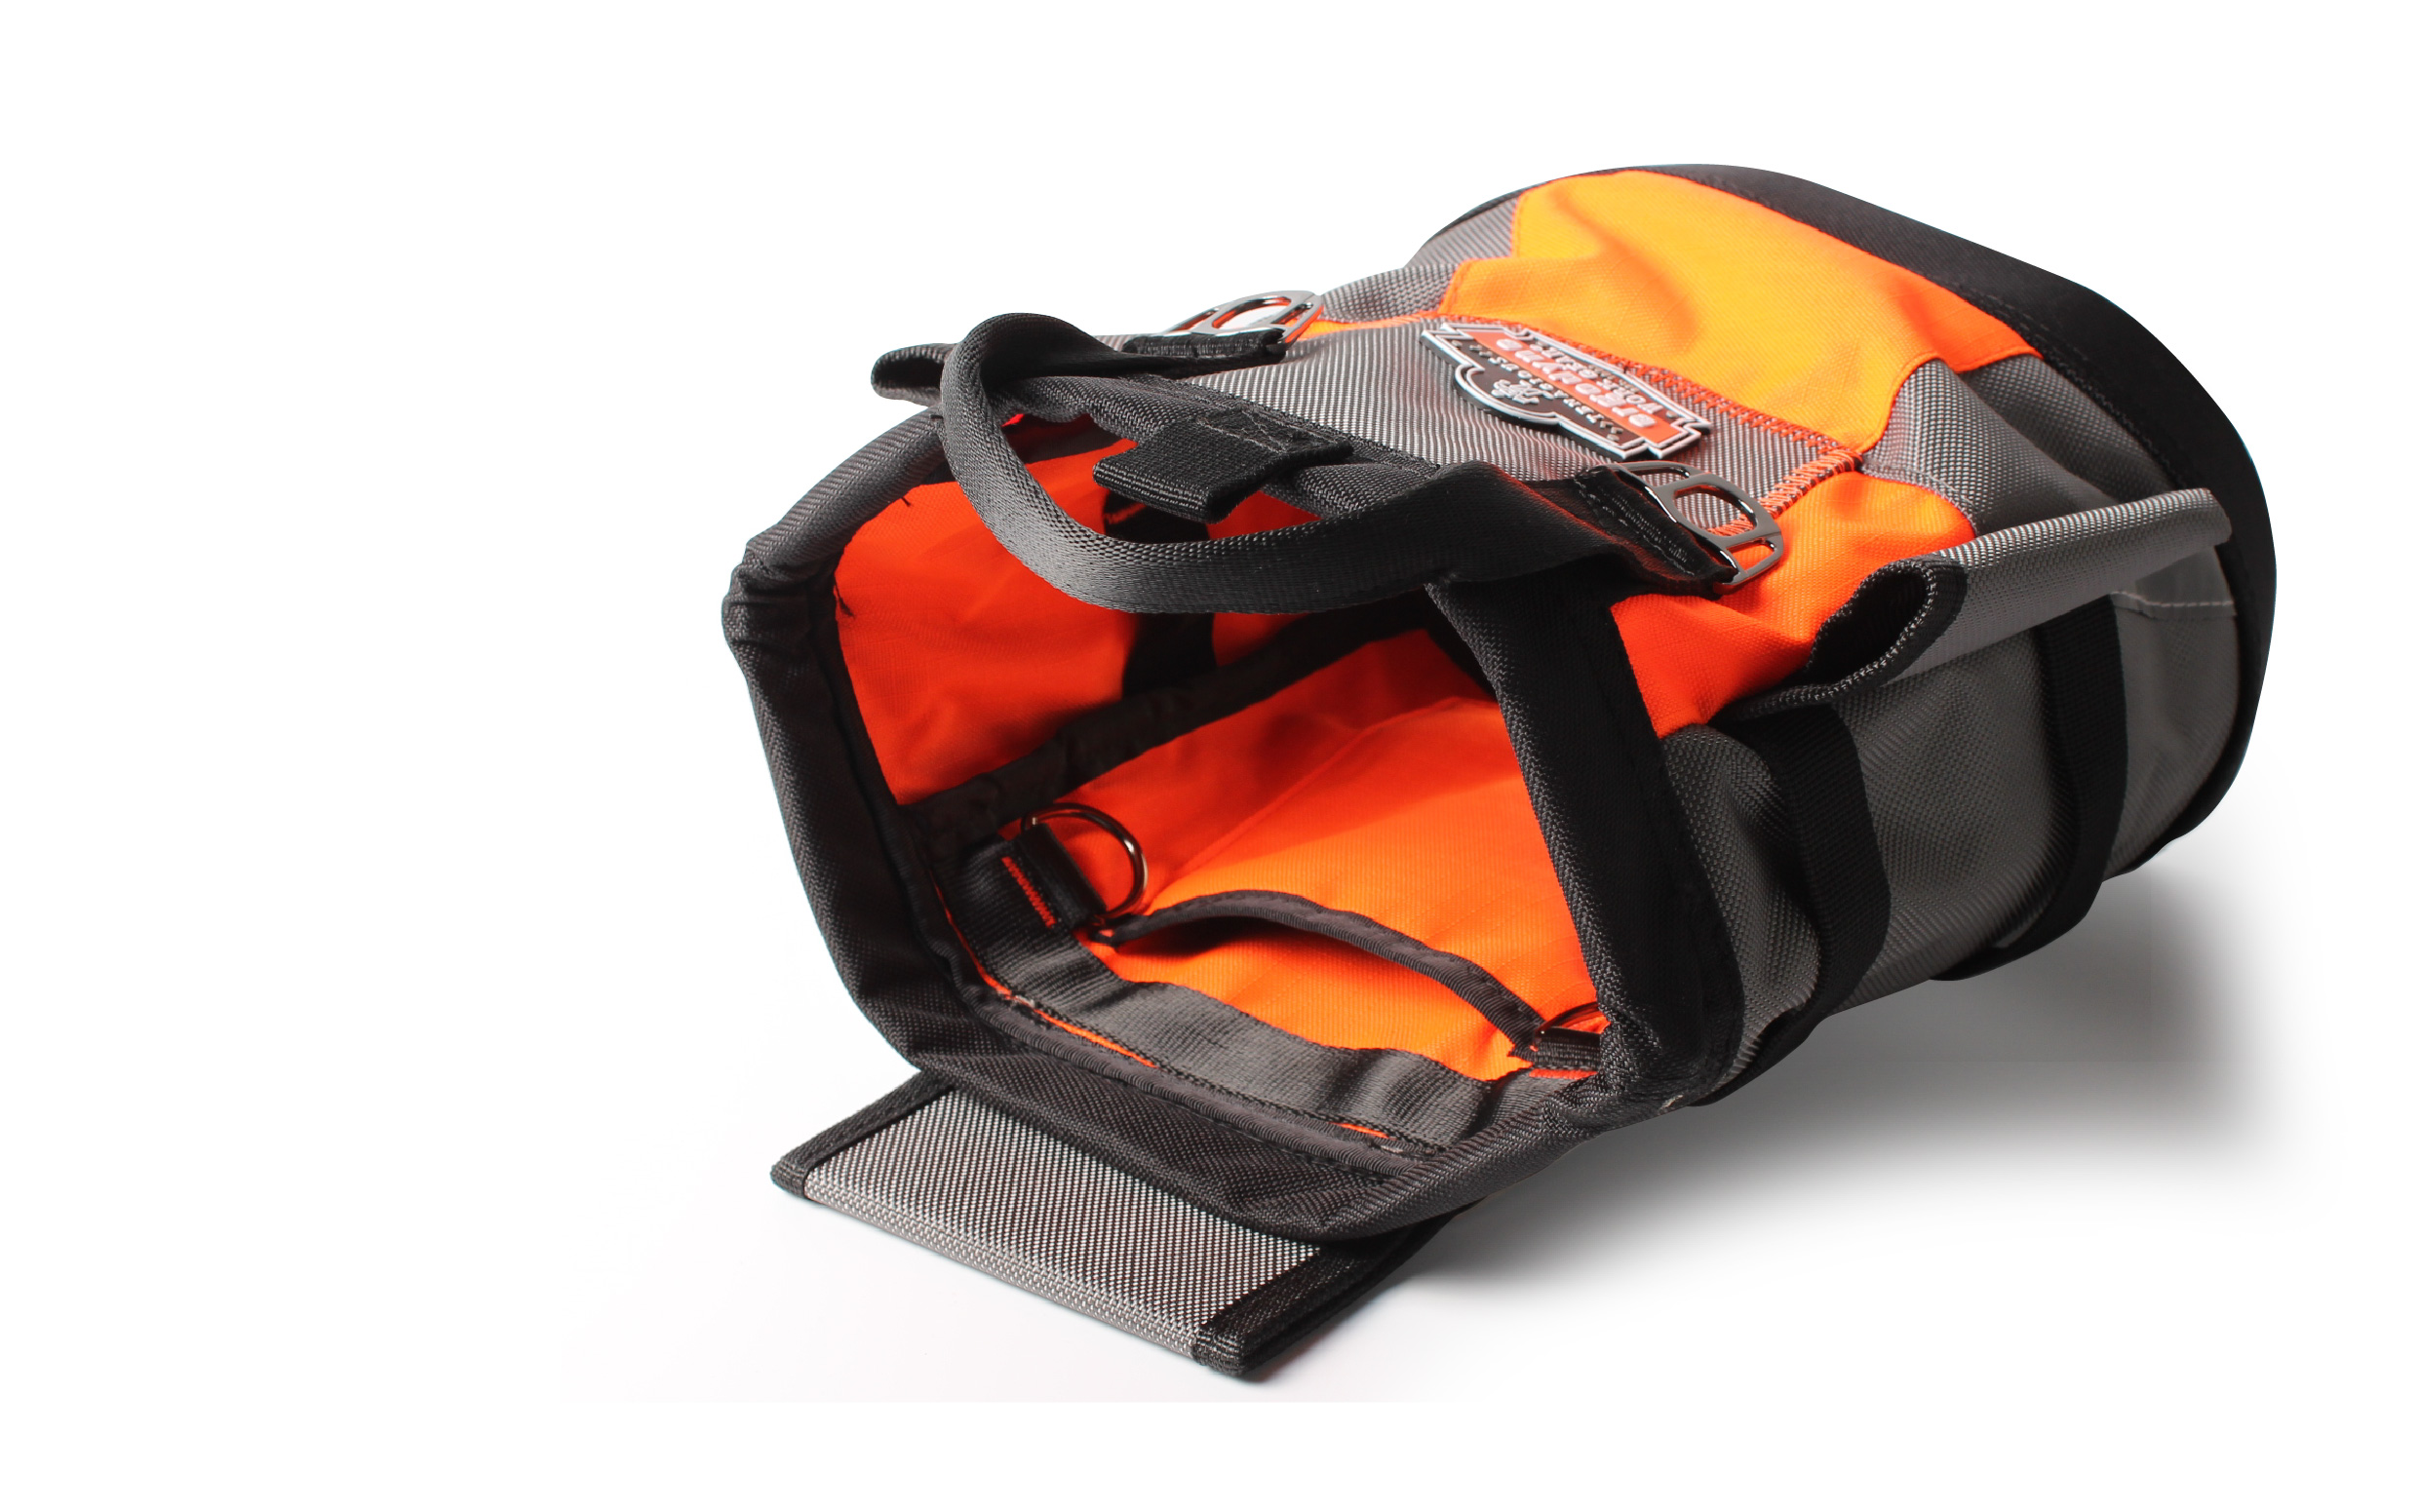 ergodyne-soft-good-industrial-work-pouch-design-inside.jpg